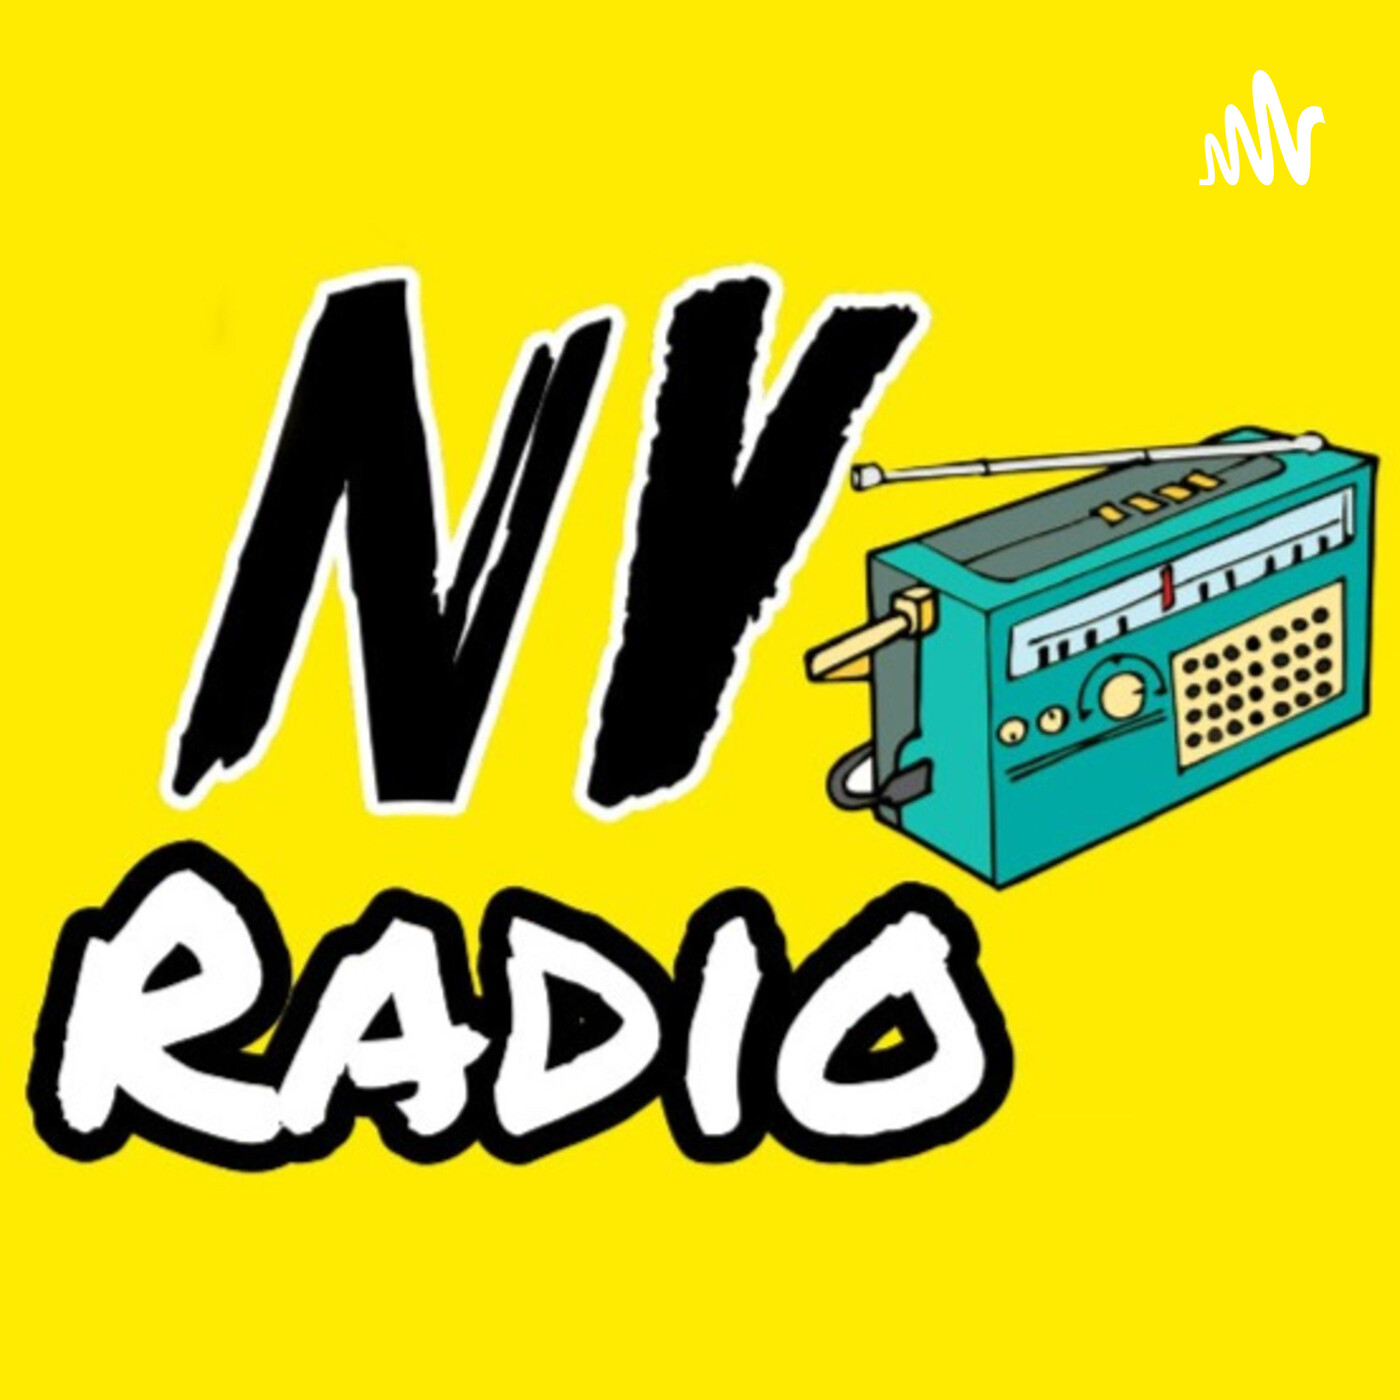 Monday Madness W/DJ NV Reckless 10.19.2020